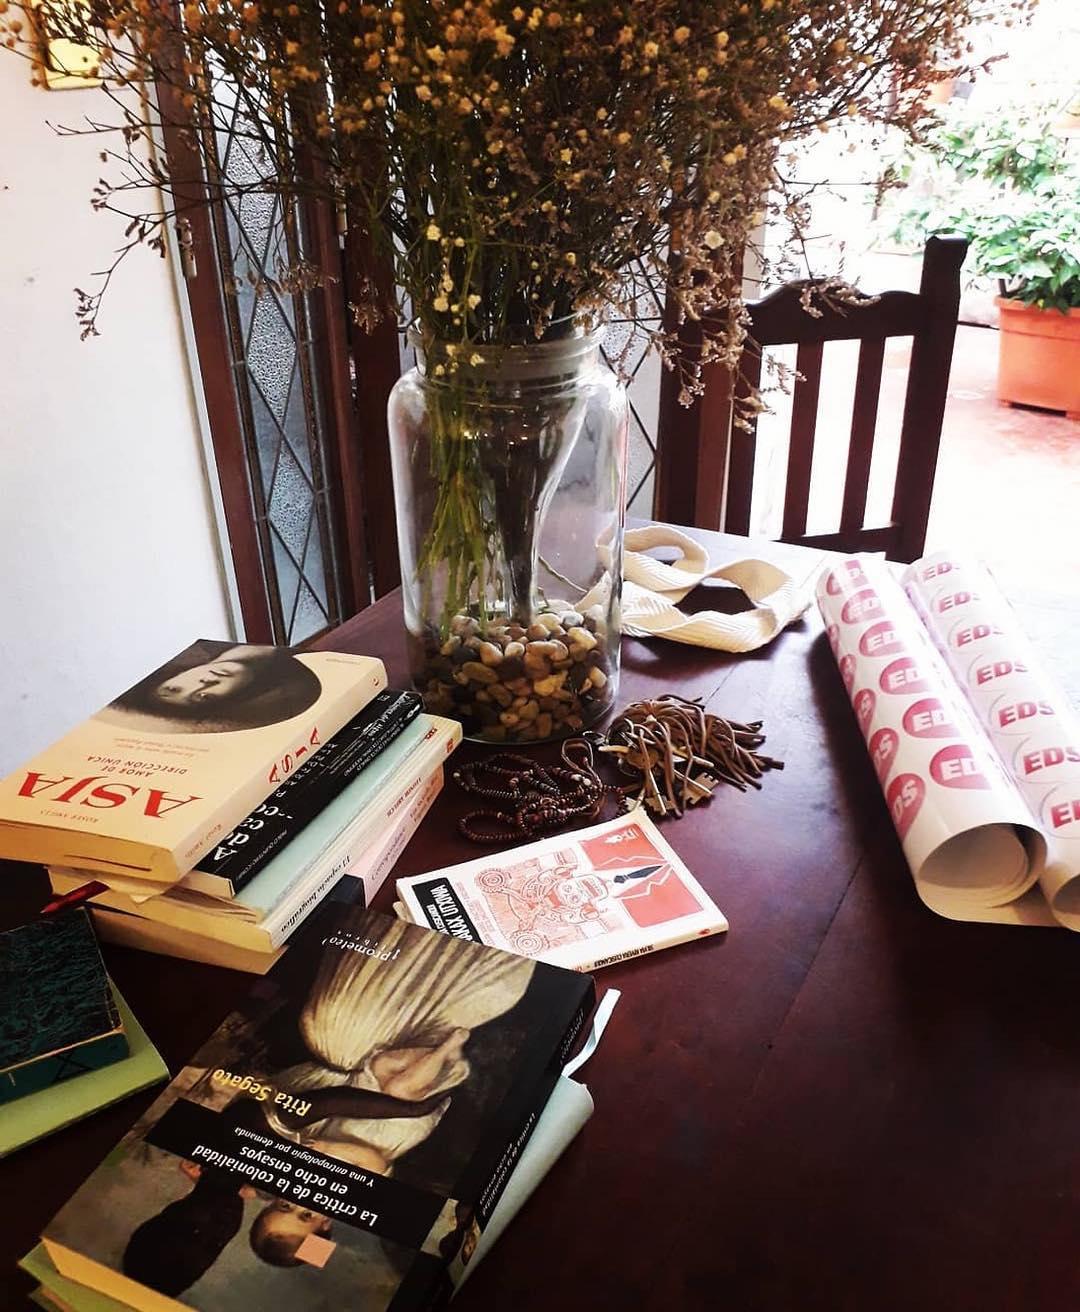 Cafès filosòfics: El filòsof, l'amor i la mort